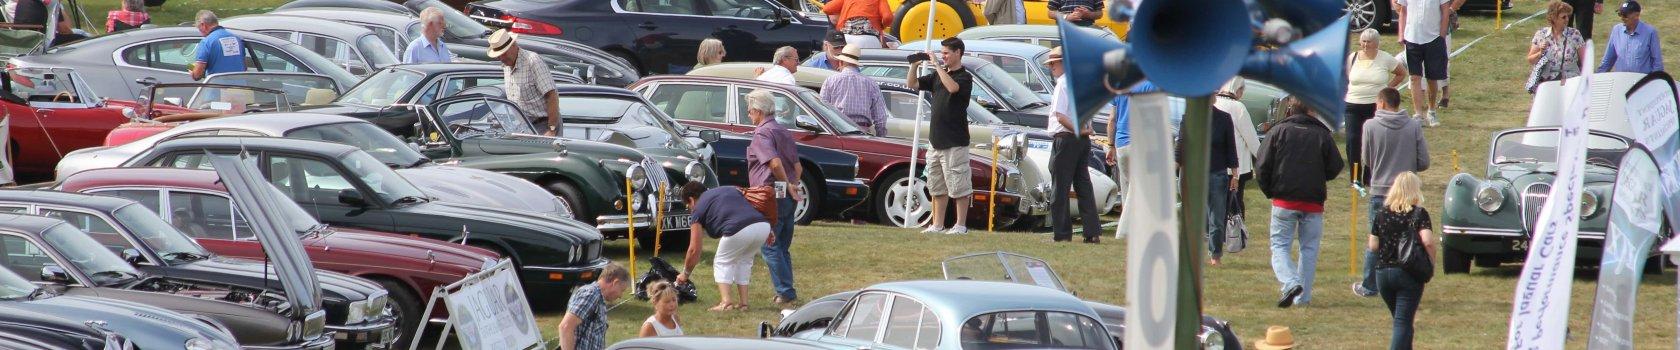 Jaguar Enthusiasts' Club Image